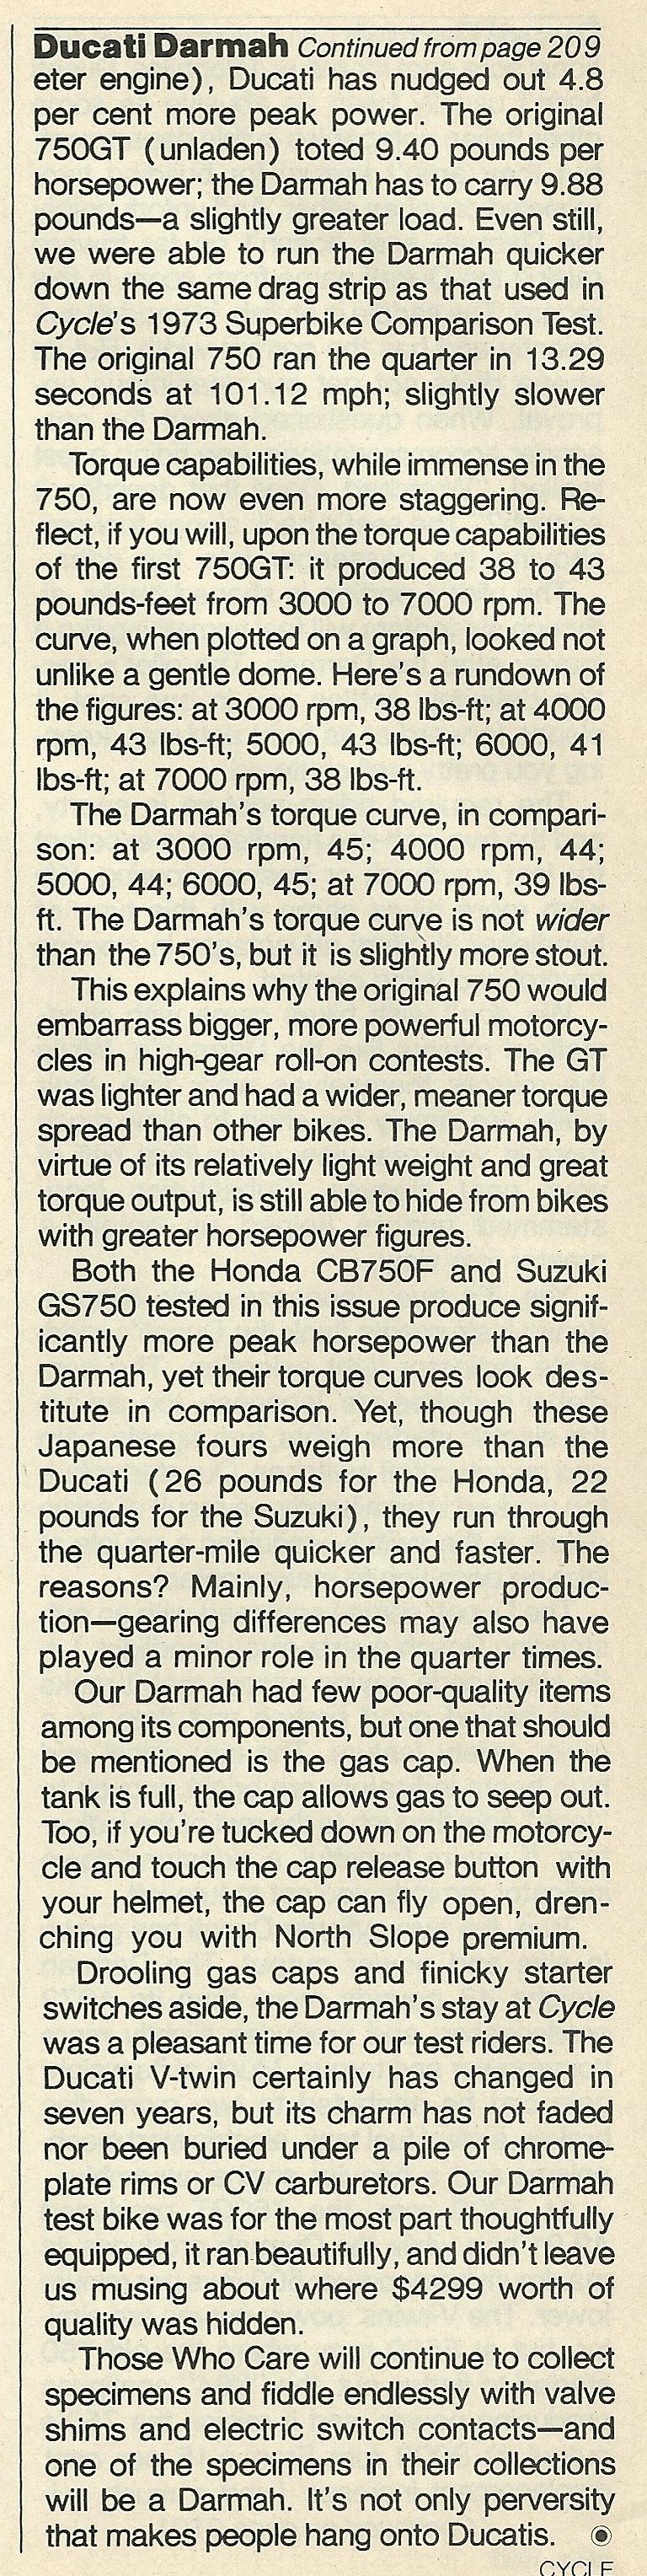 1980 Ducati Darmah 900 SD road test 10.jpg